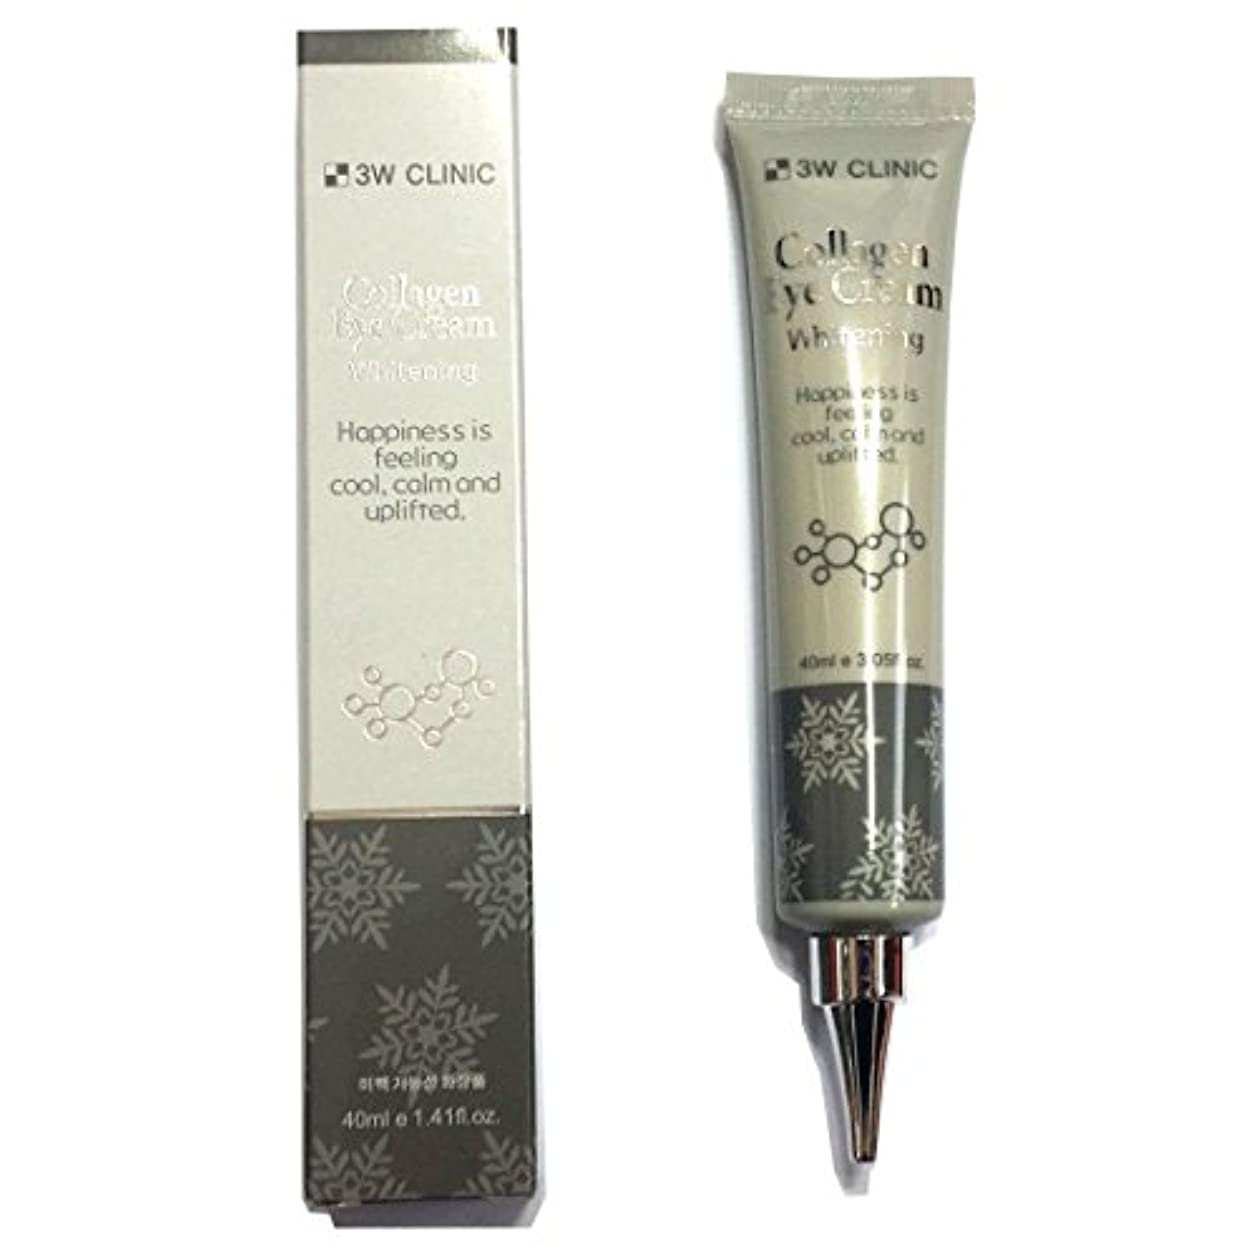 [3W CLINIC] コラーゲンアイクリームホワイトニング40ml X 1ea / Collagen Eye Cream Whitening 40ml X 1ea / しっとりしっとり / Anti wrinkles,...